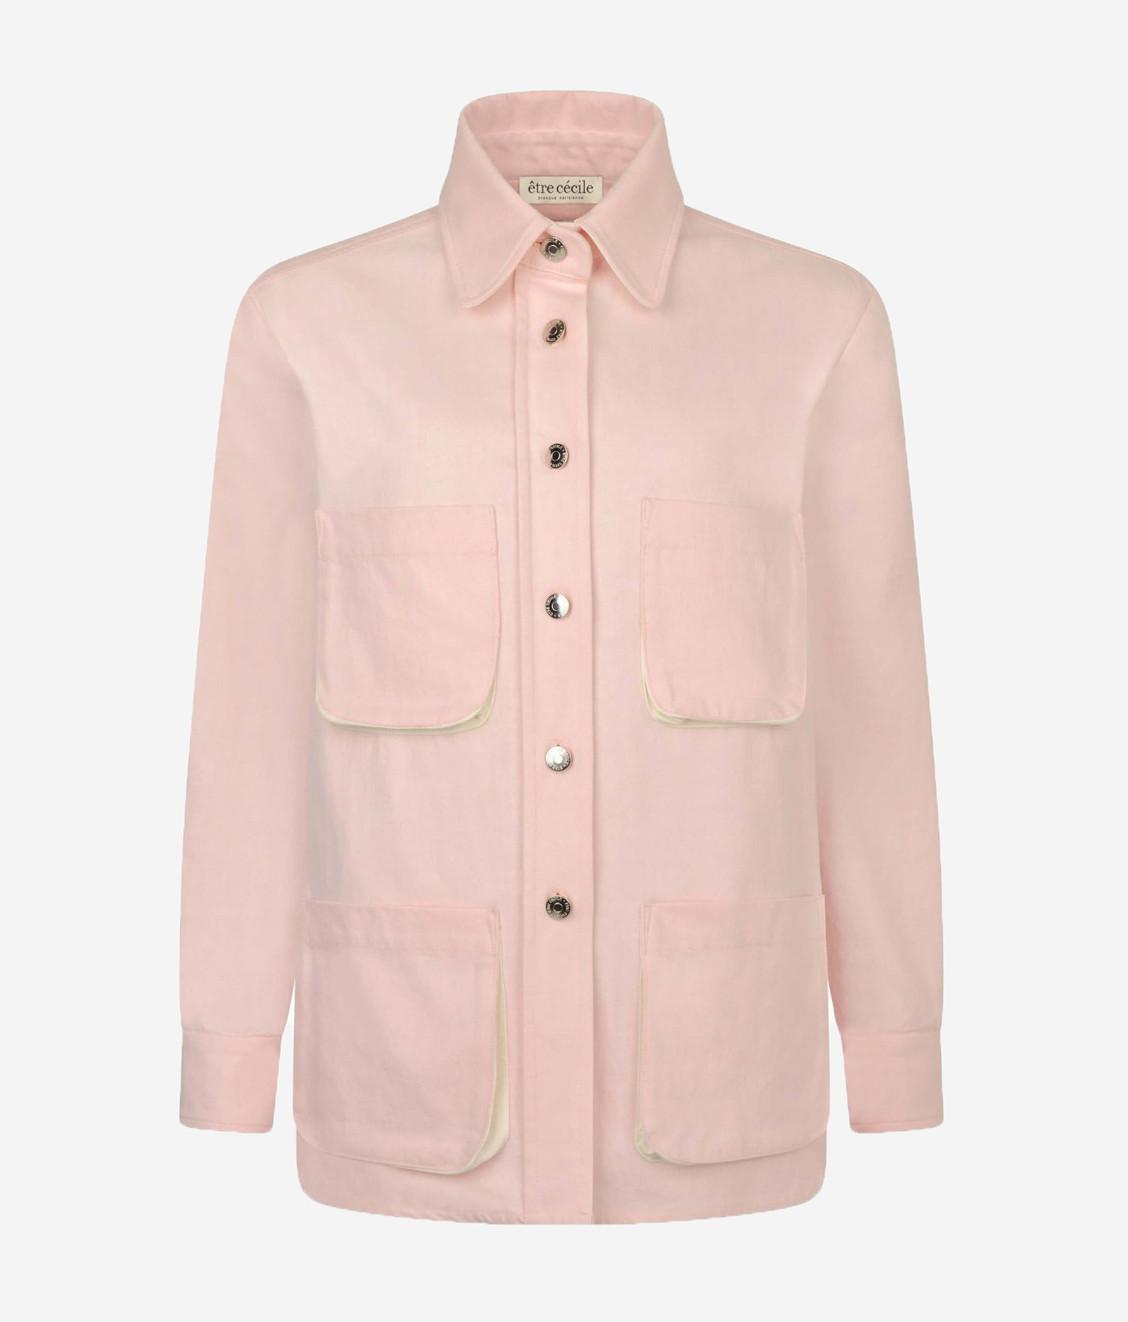 Etre Cecile Etre Cecile St Germain Denim Jacket Pink